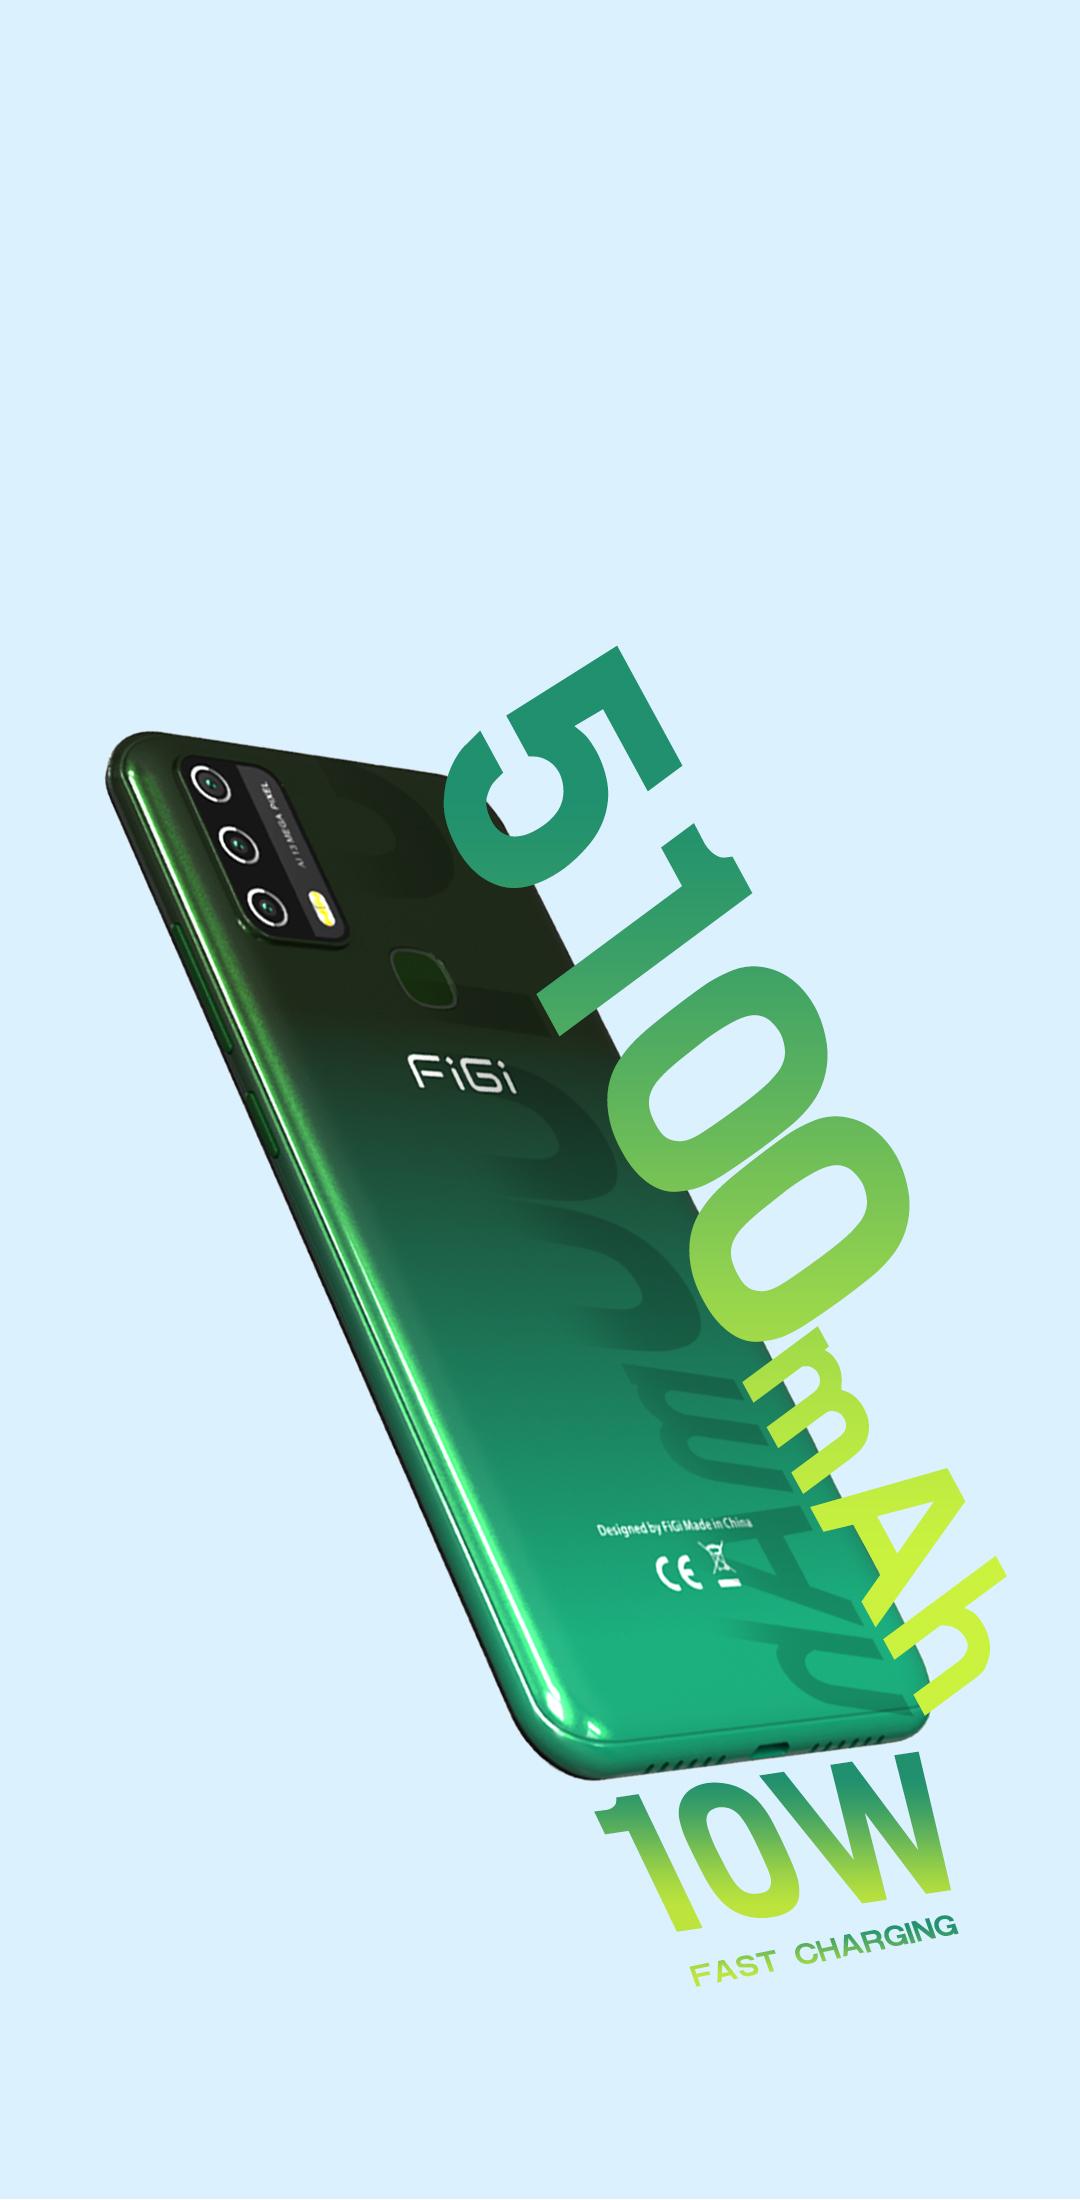 Смартфон FiGi Note 3 3/32Gb 7